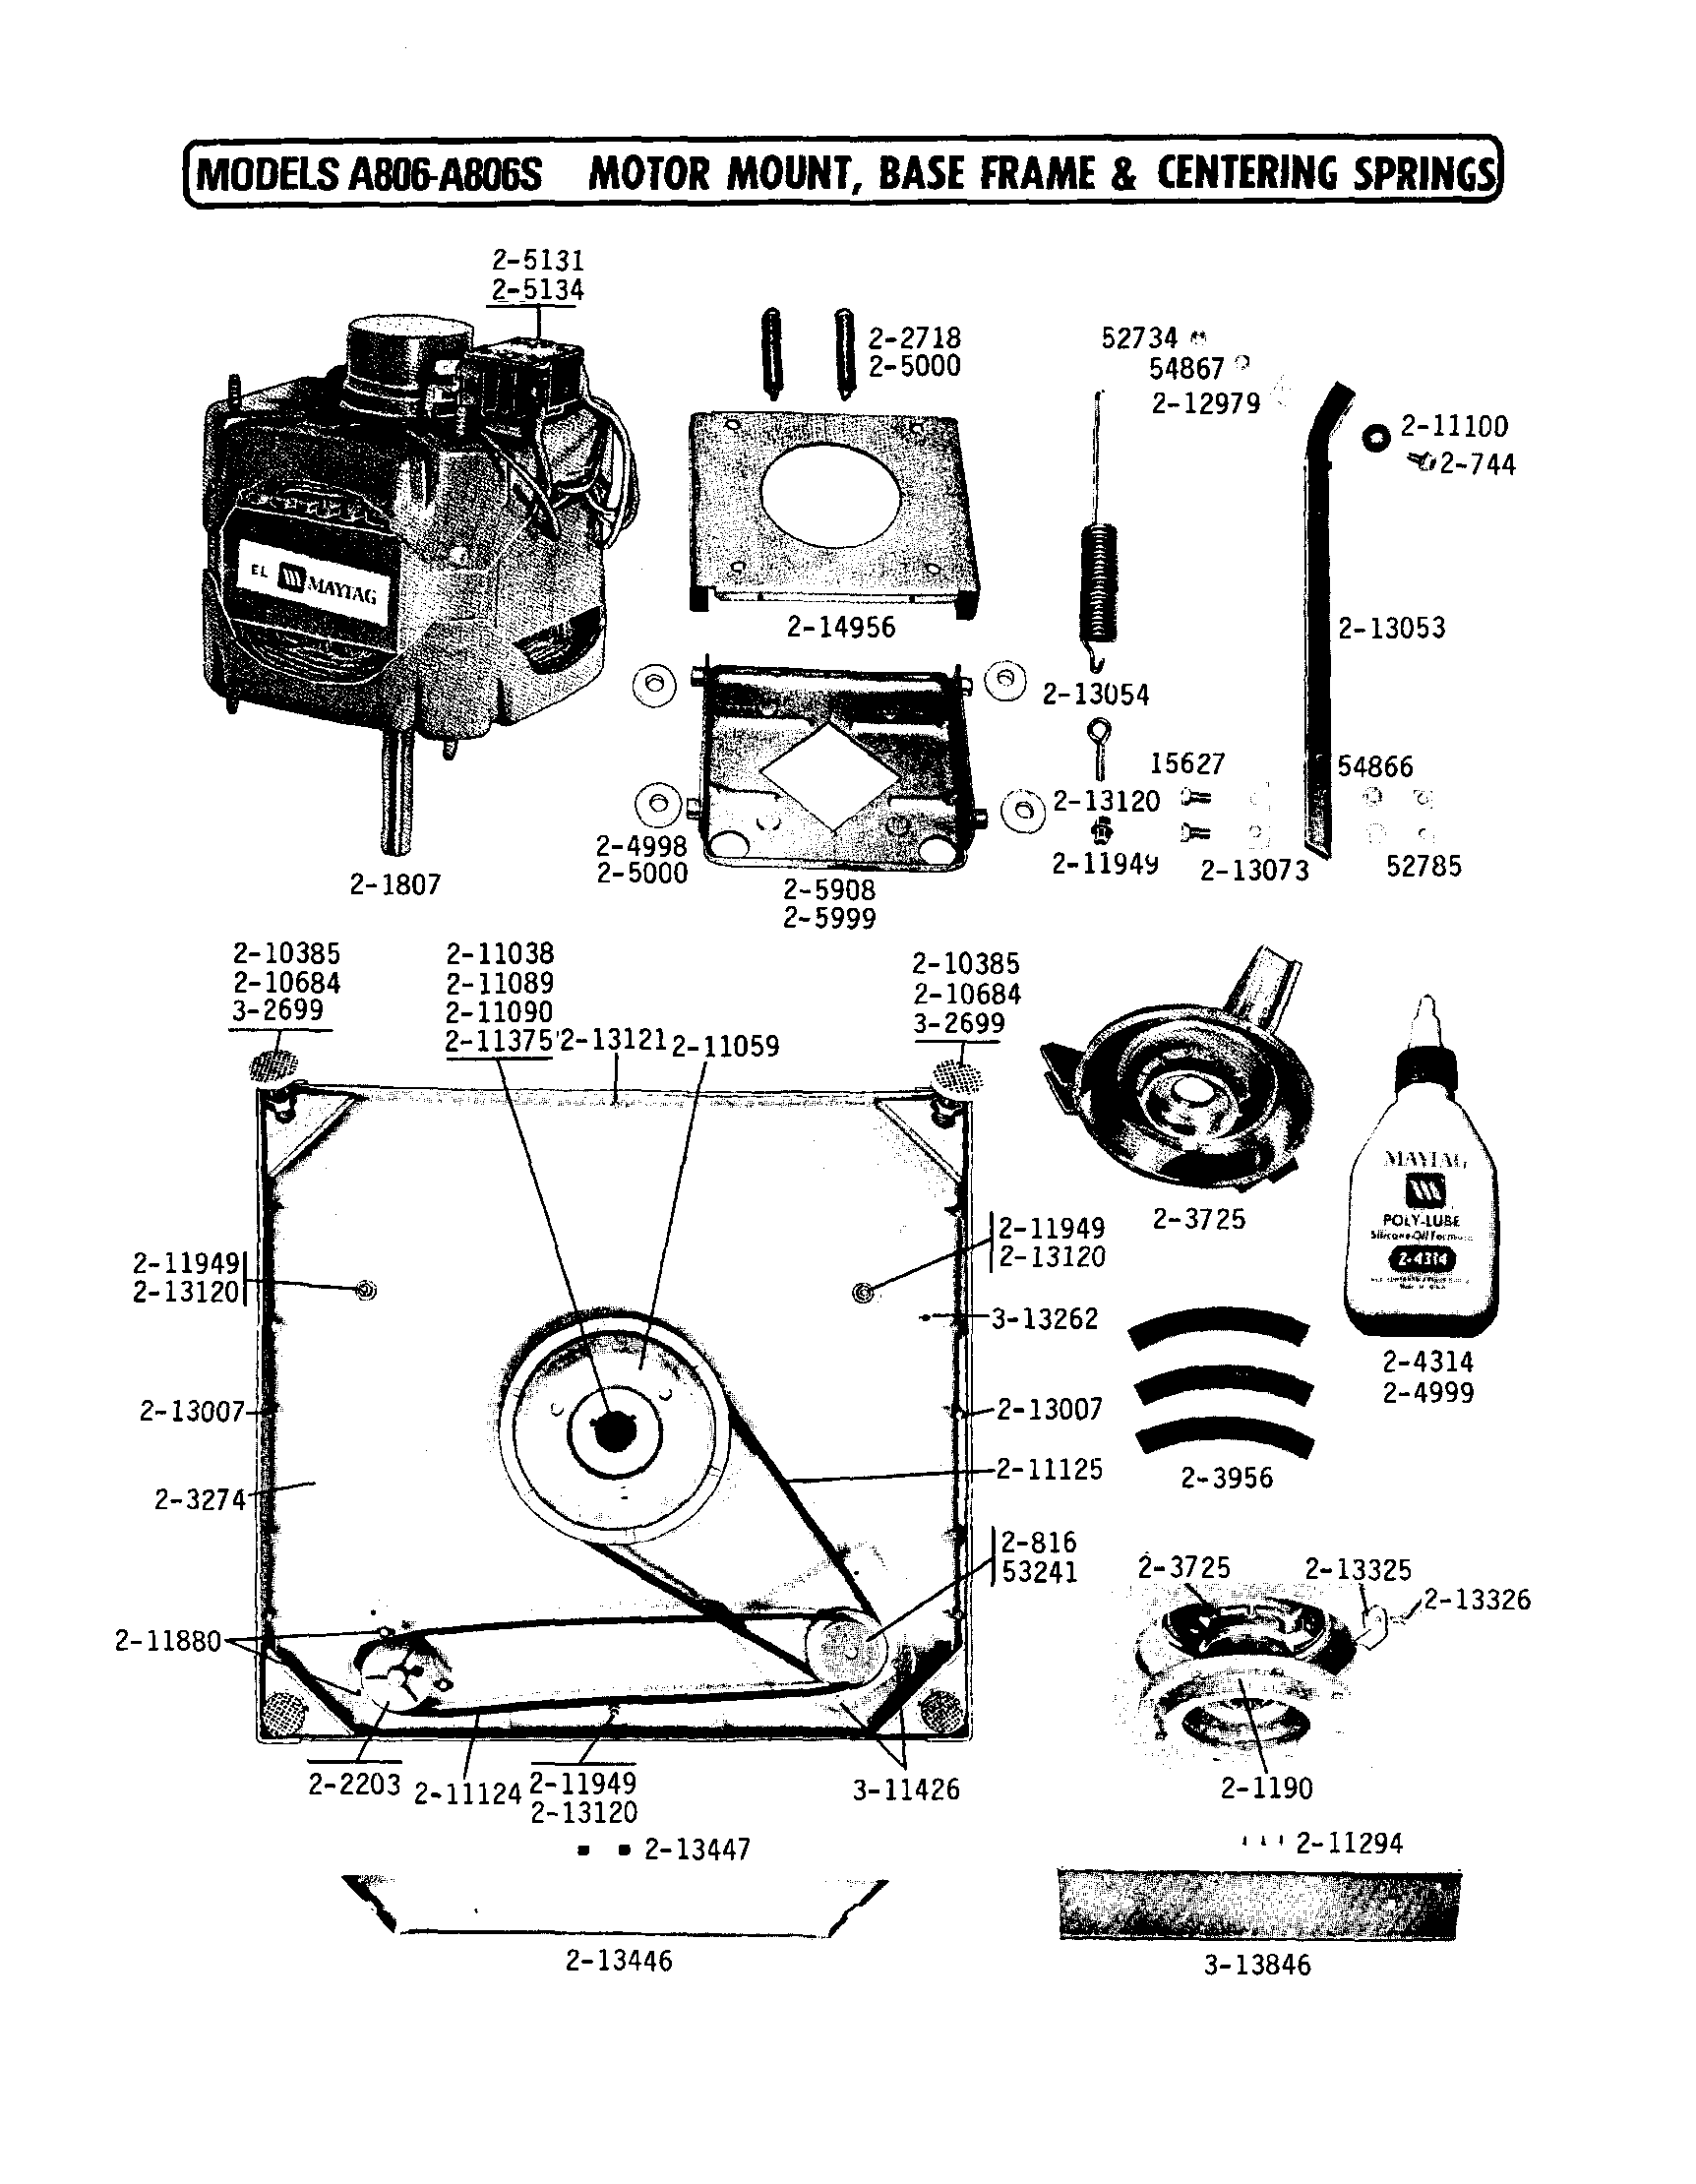 hotpoint oven wiring diagram e30 m50 stove v9 schwabenschamanen de ep0023126a1 electric well pump google patents on 2 wire rh 15 art brut creation gas